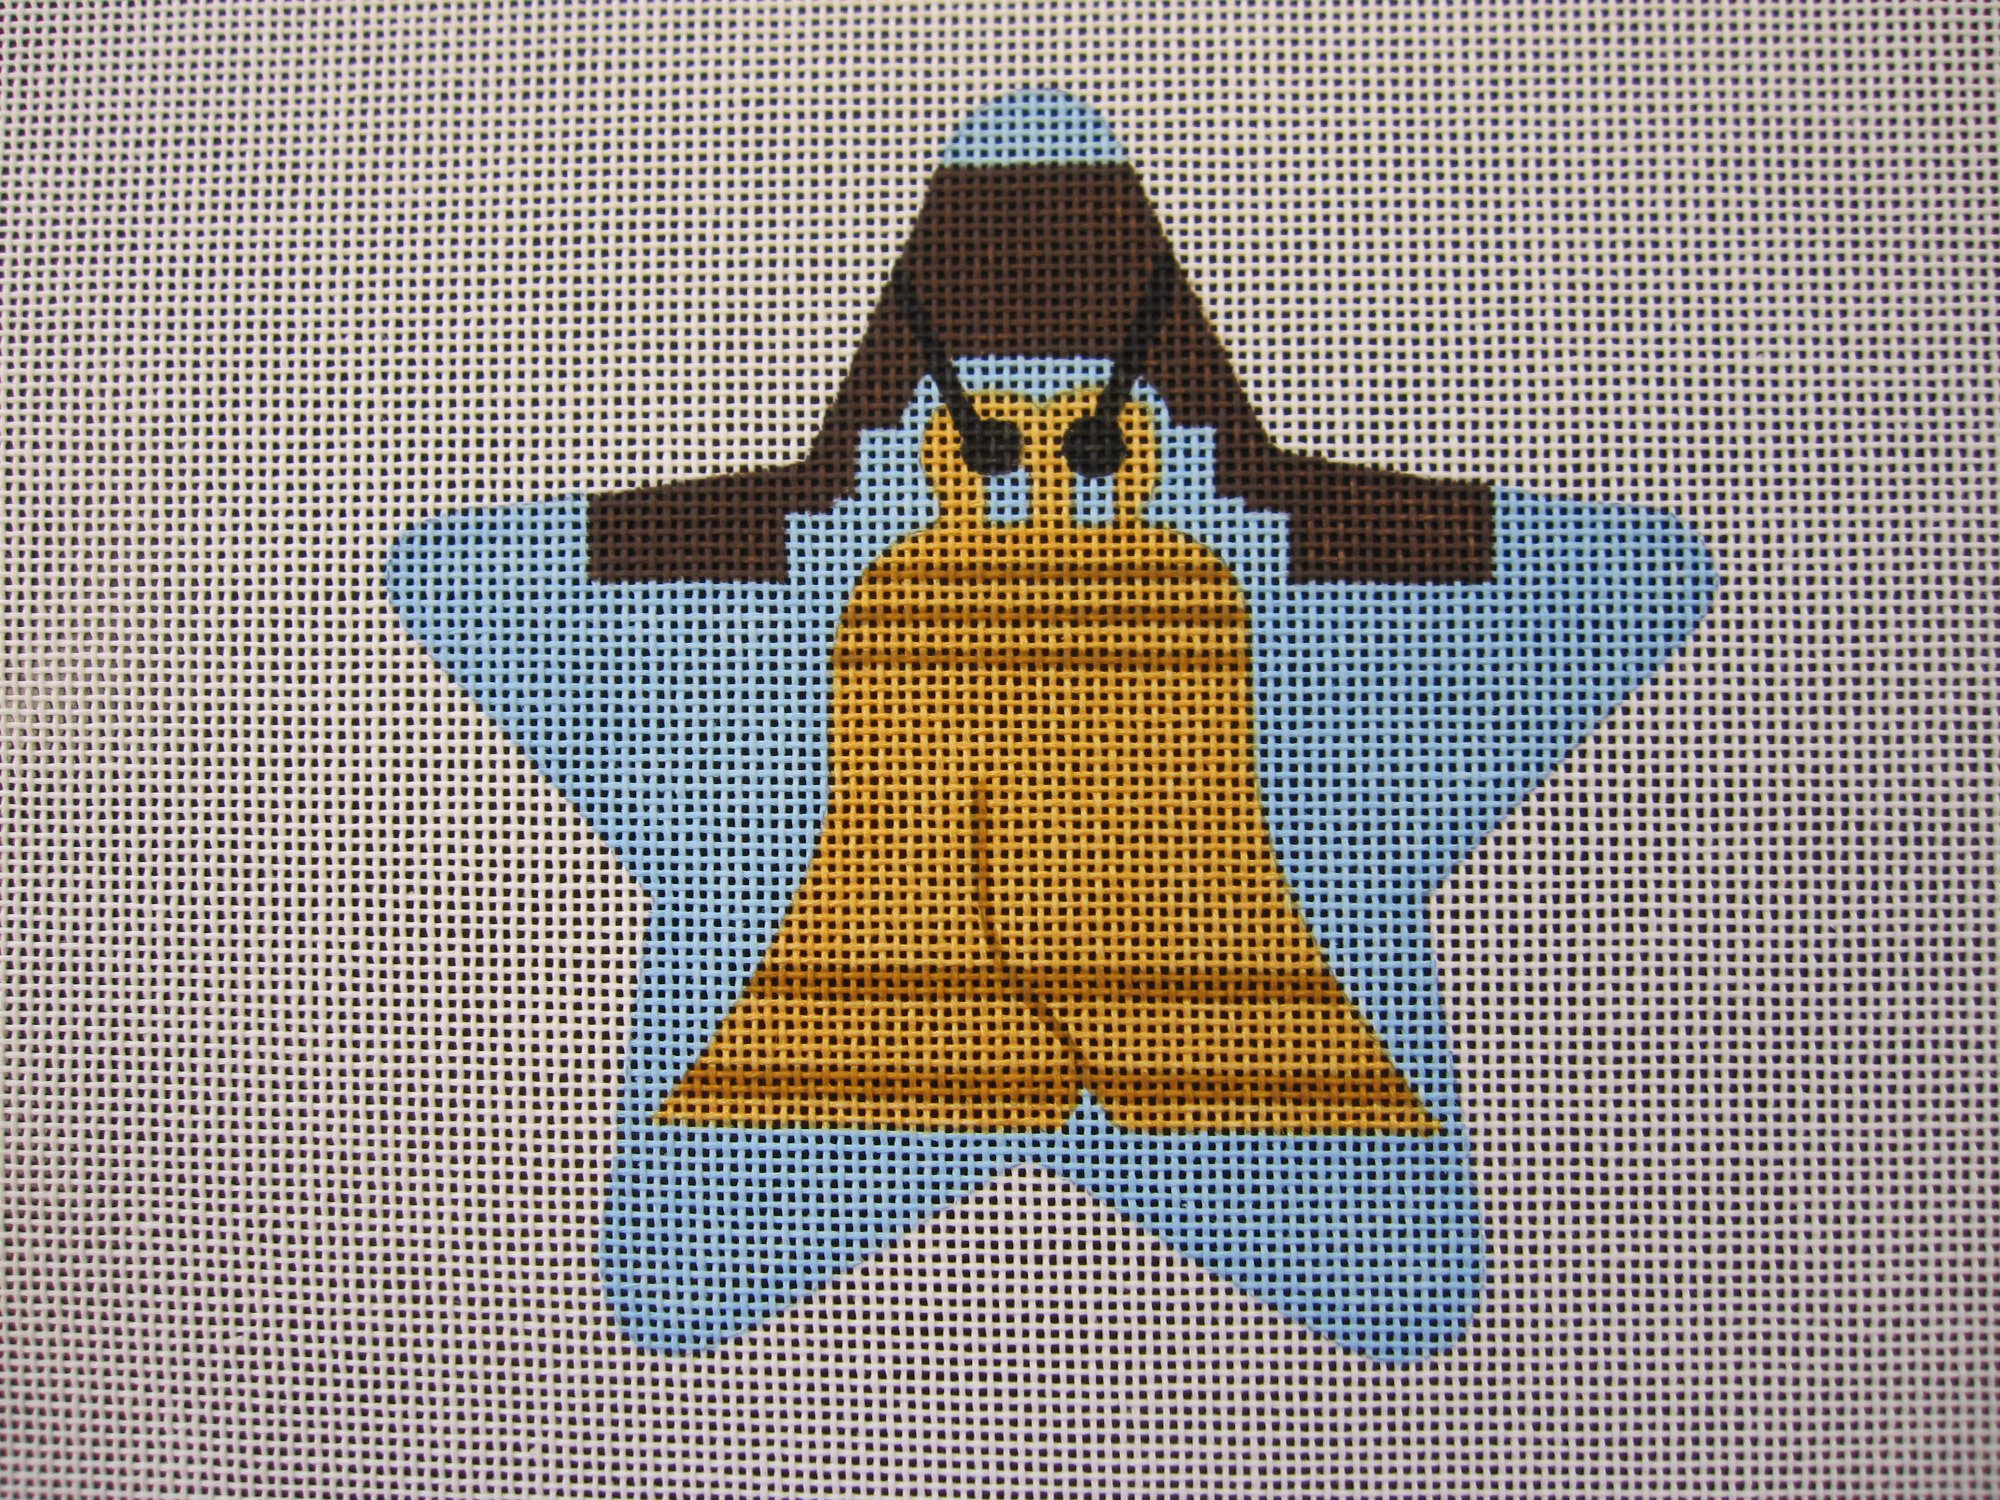 Liberty Bell Star